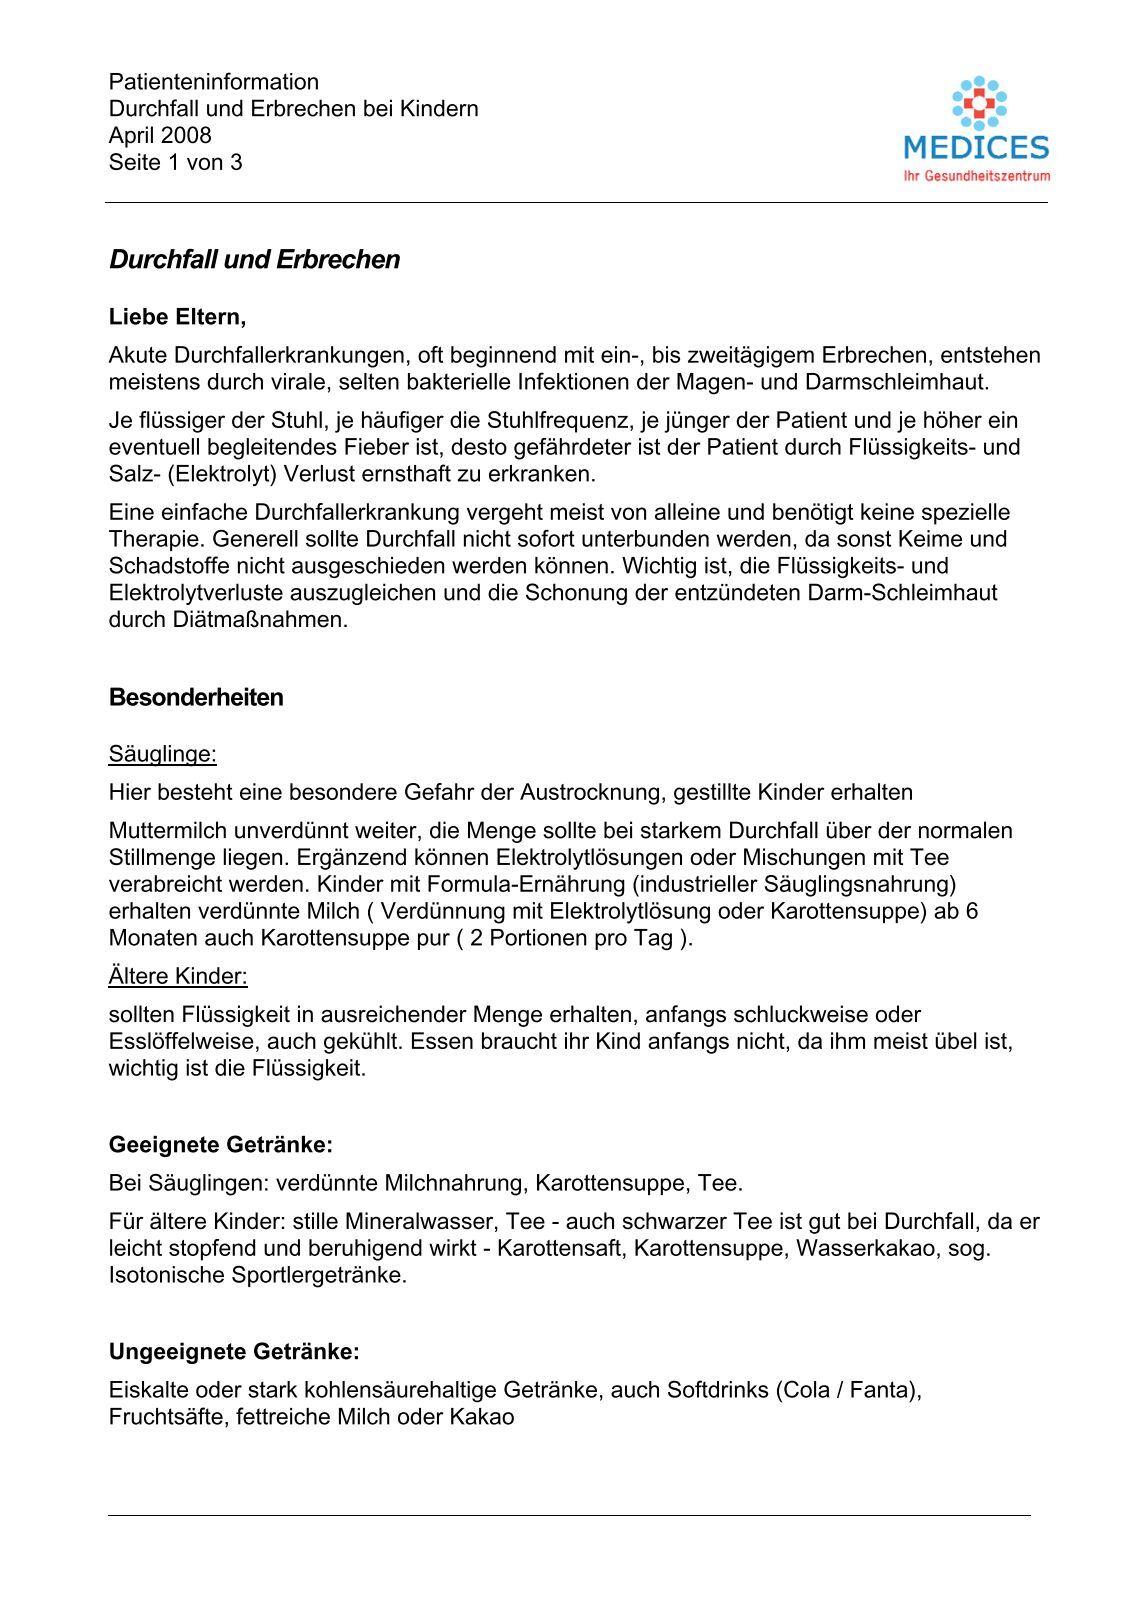 Heller Stuhl Erbrechen Fabulous Eisenmangel With Heller Stuhl